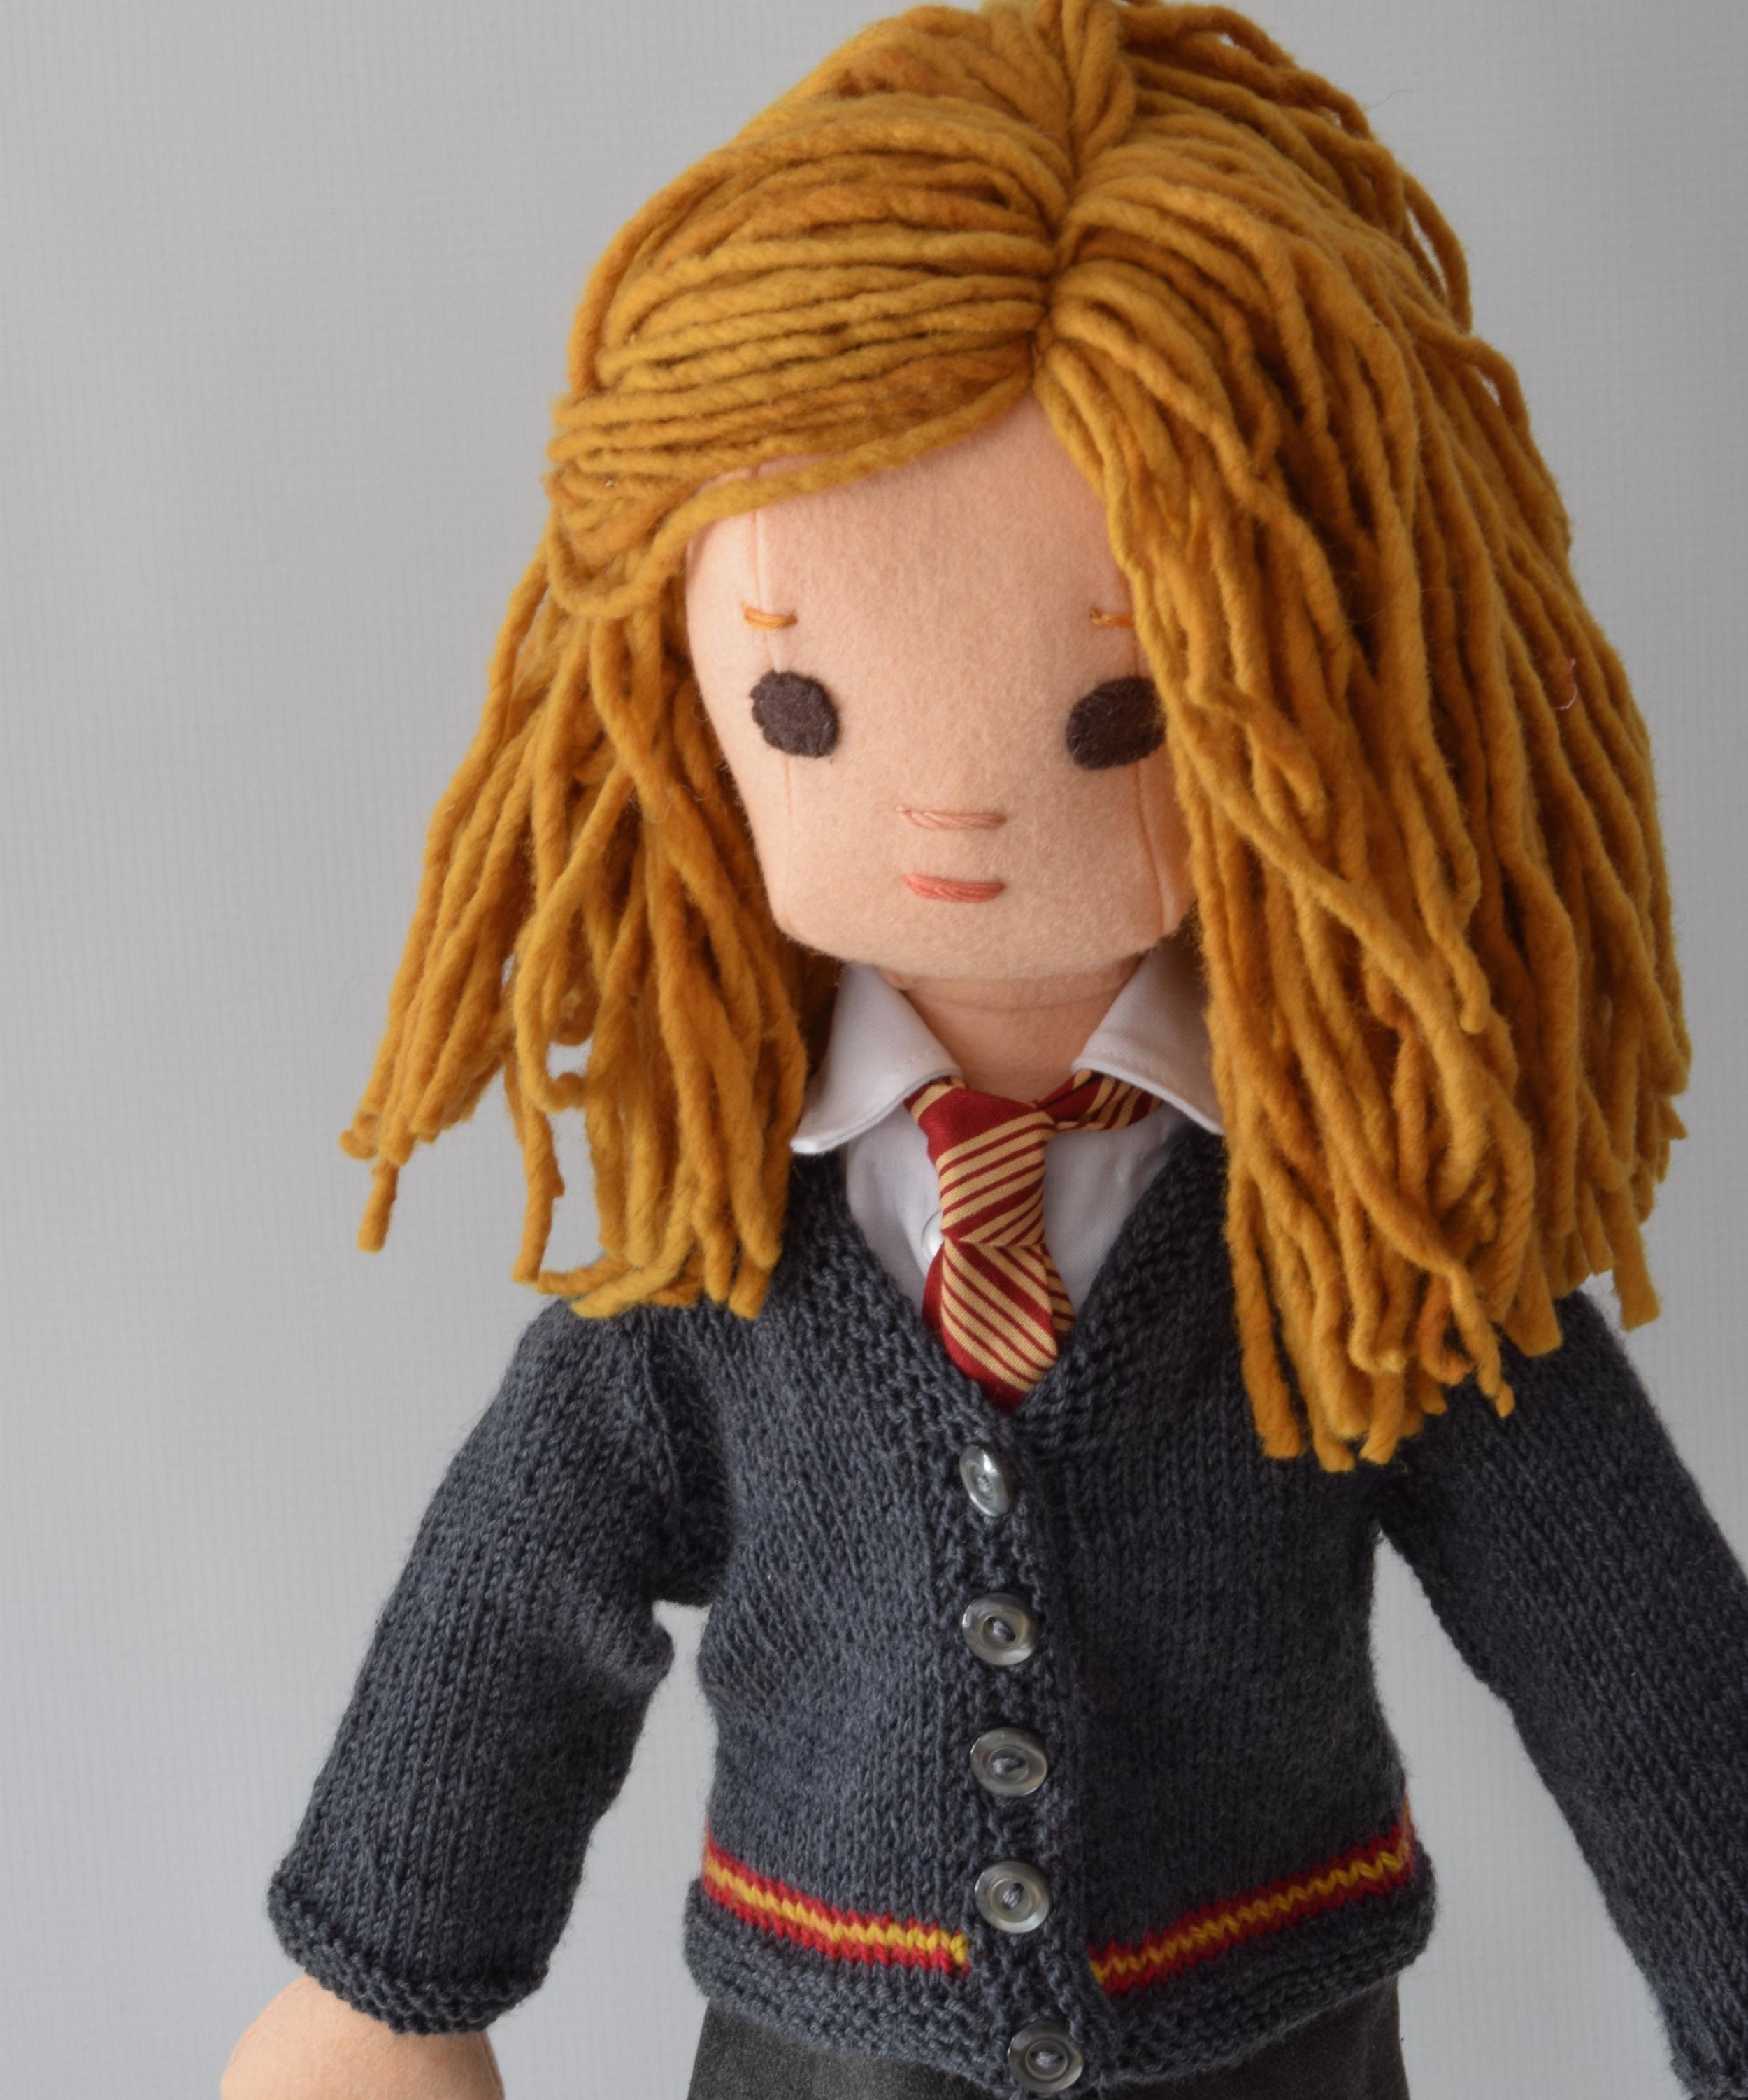 The Handmade Dolls-637.jpg